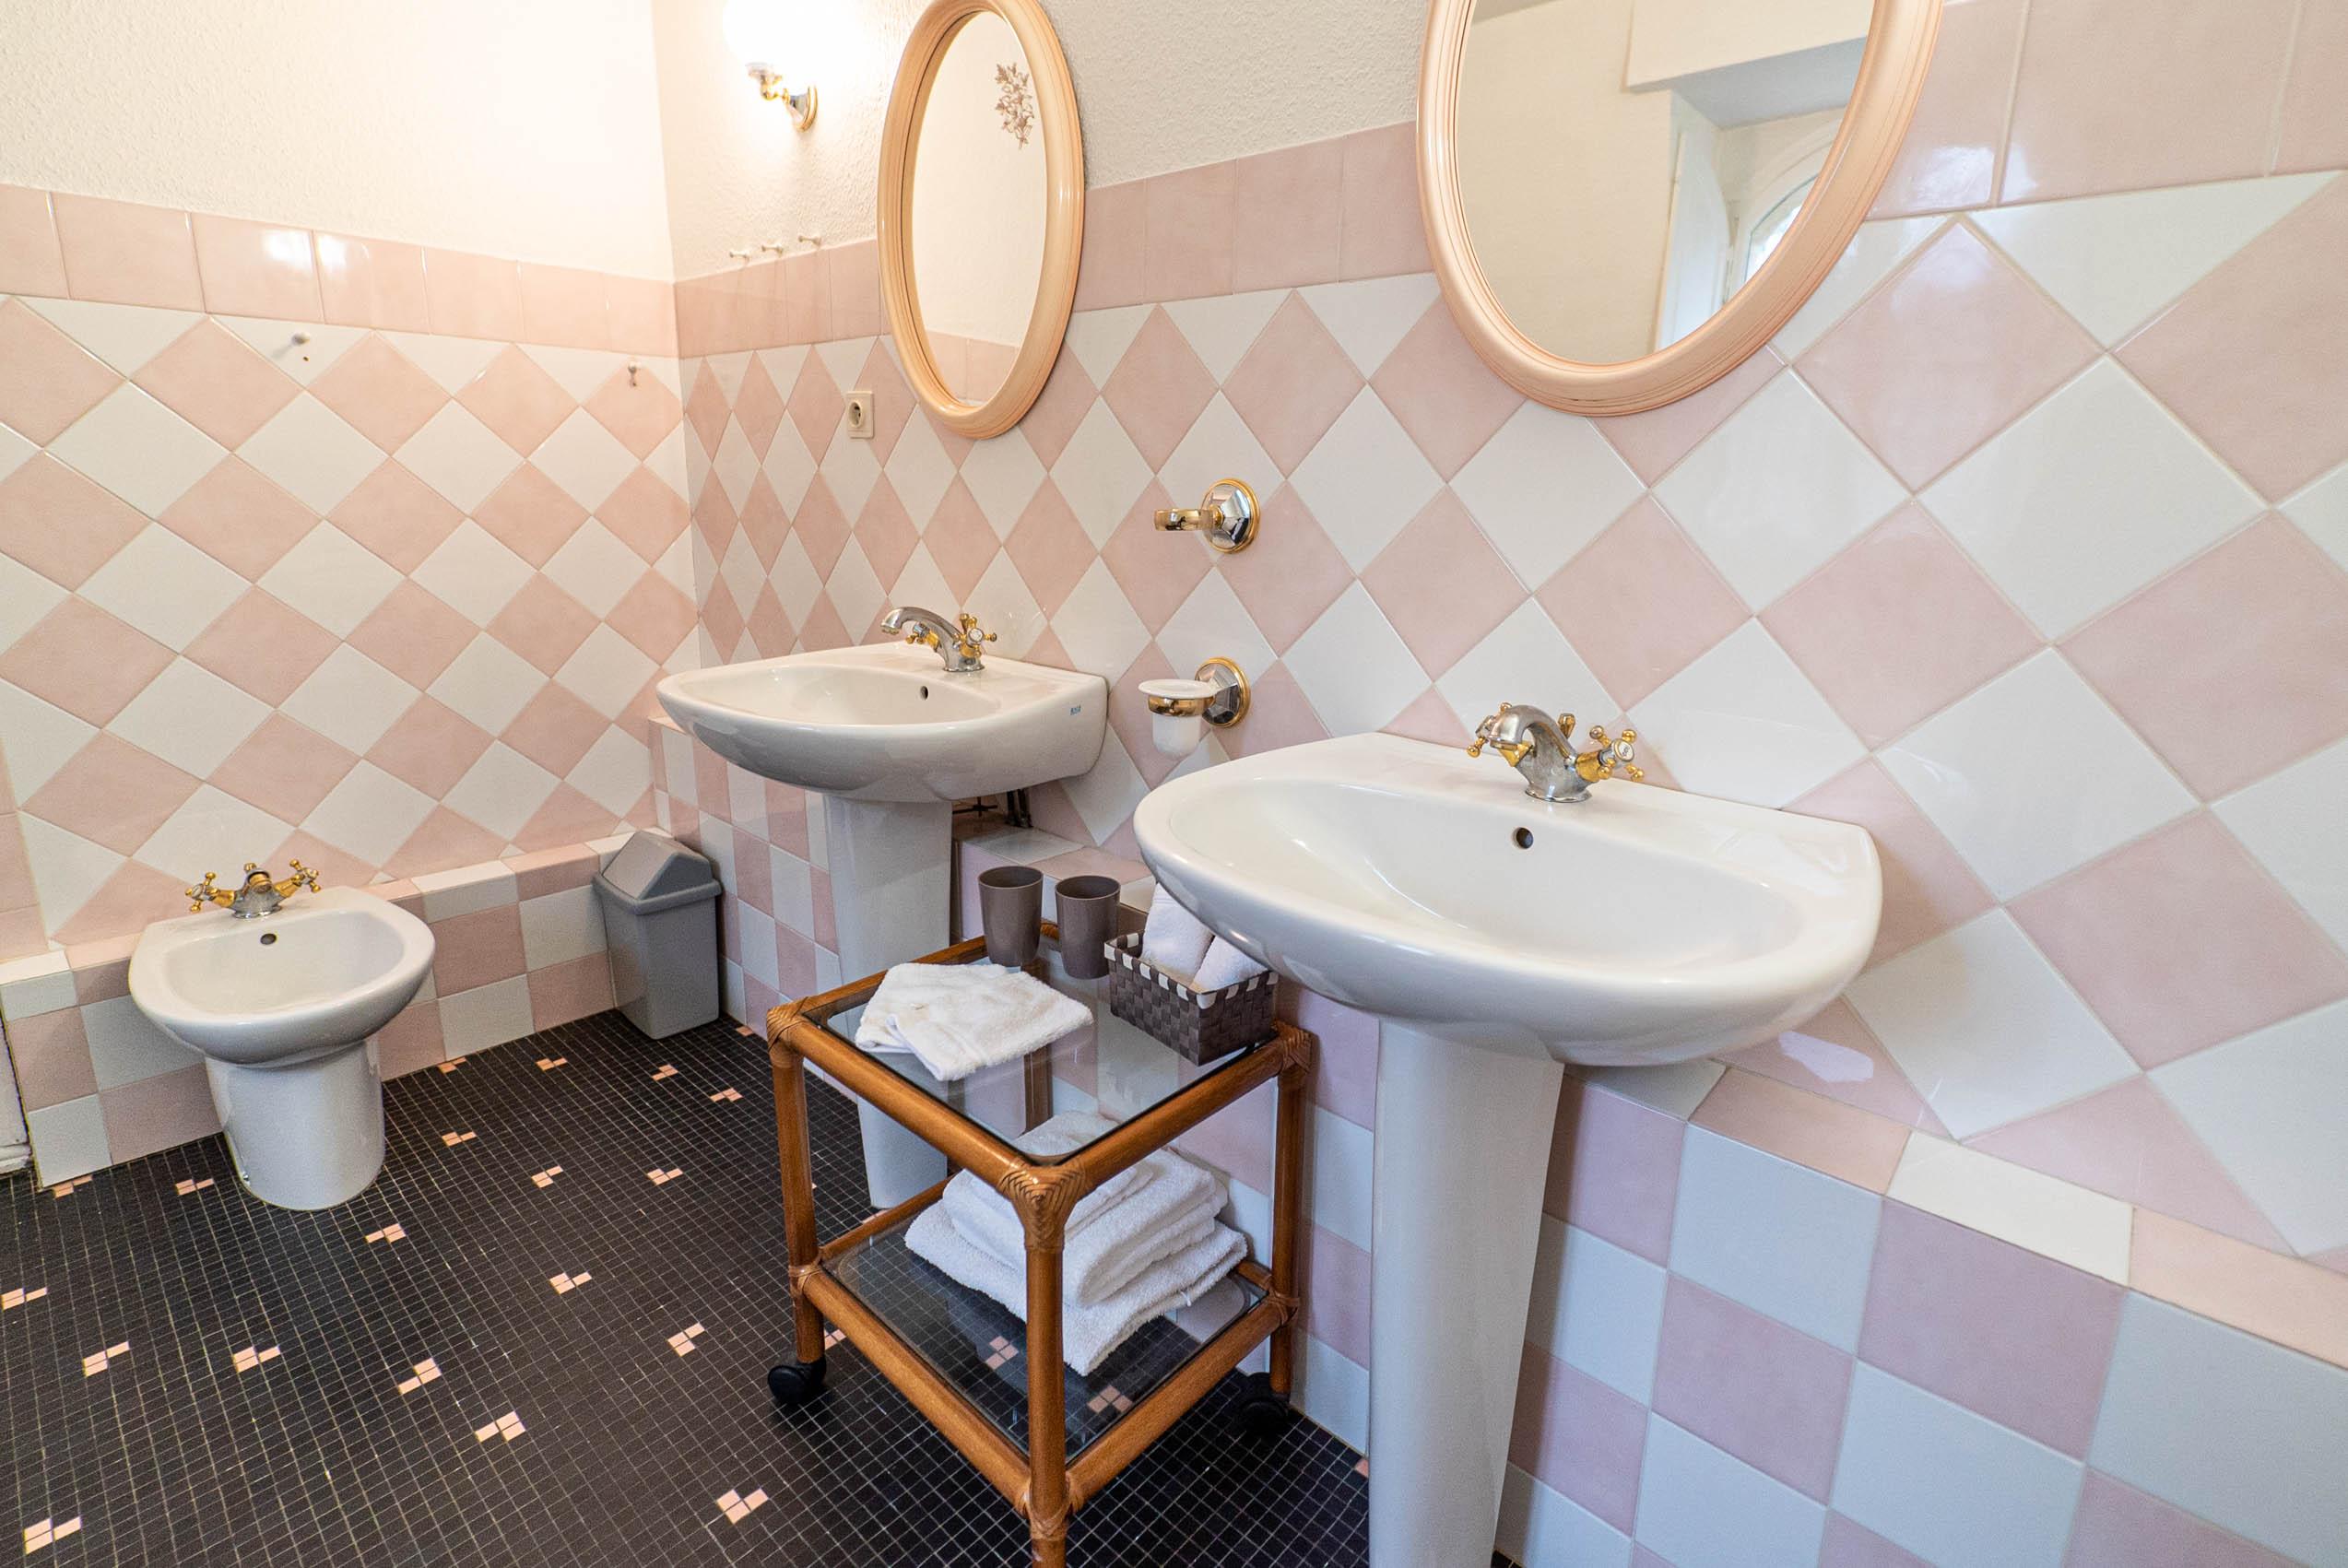 salle de bain suite marquise chateau Rauly location bergerac Monbazillac